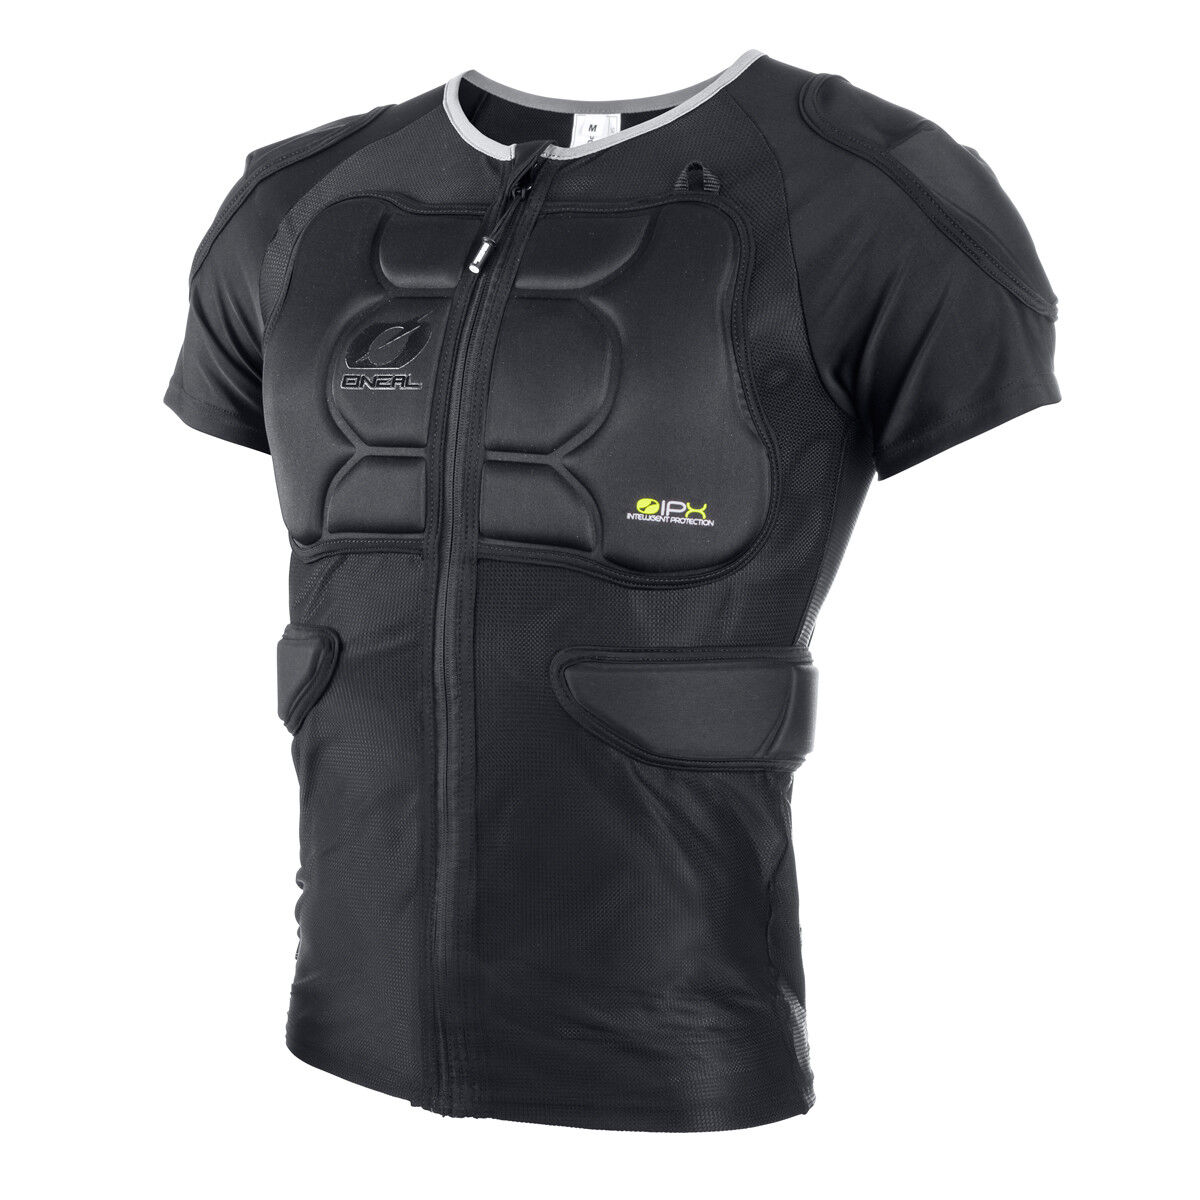 O'neal Bullet Proof Protector Protector Sleeve Protektorshirt kurz schwarz 2019 Oneal